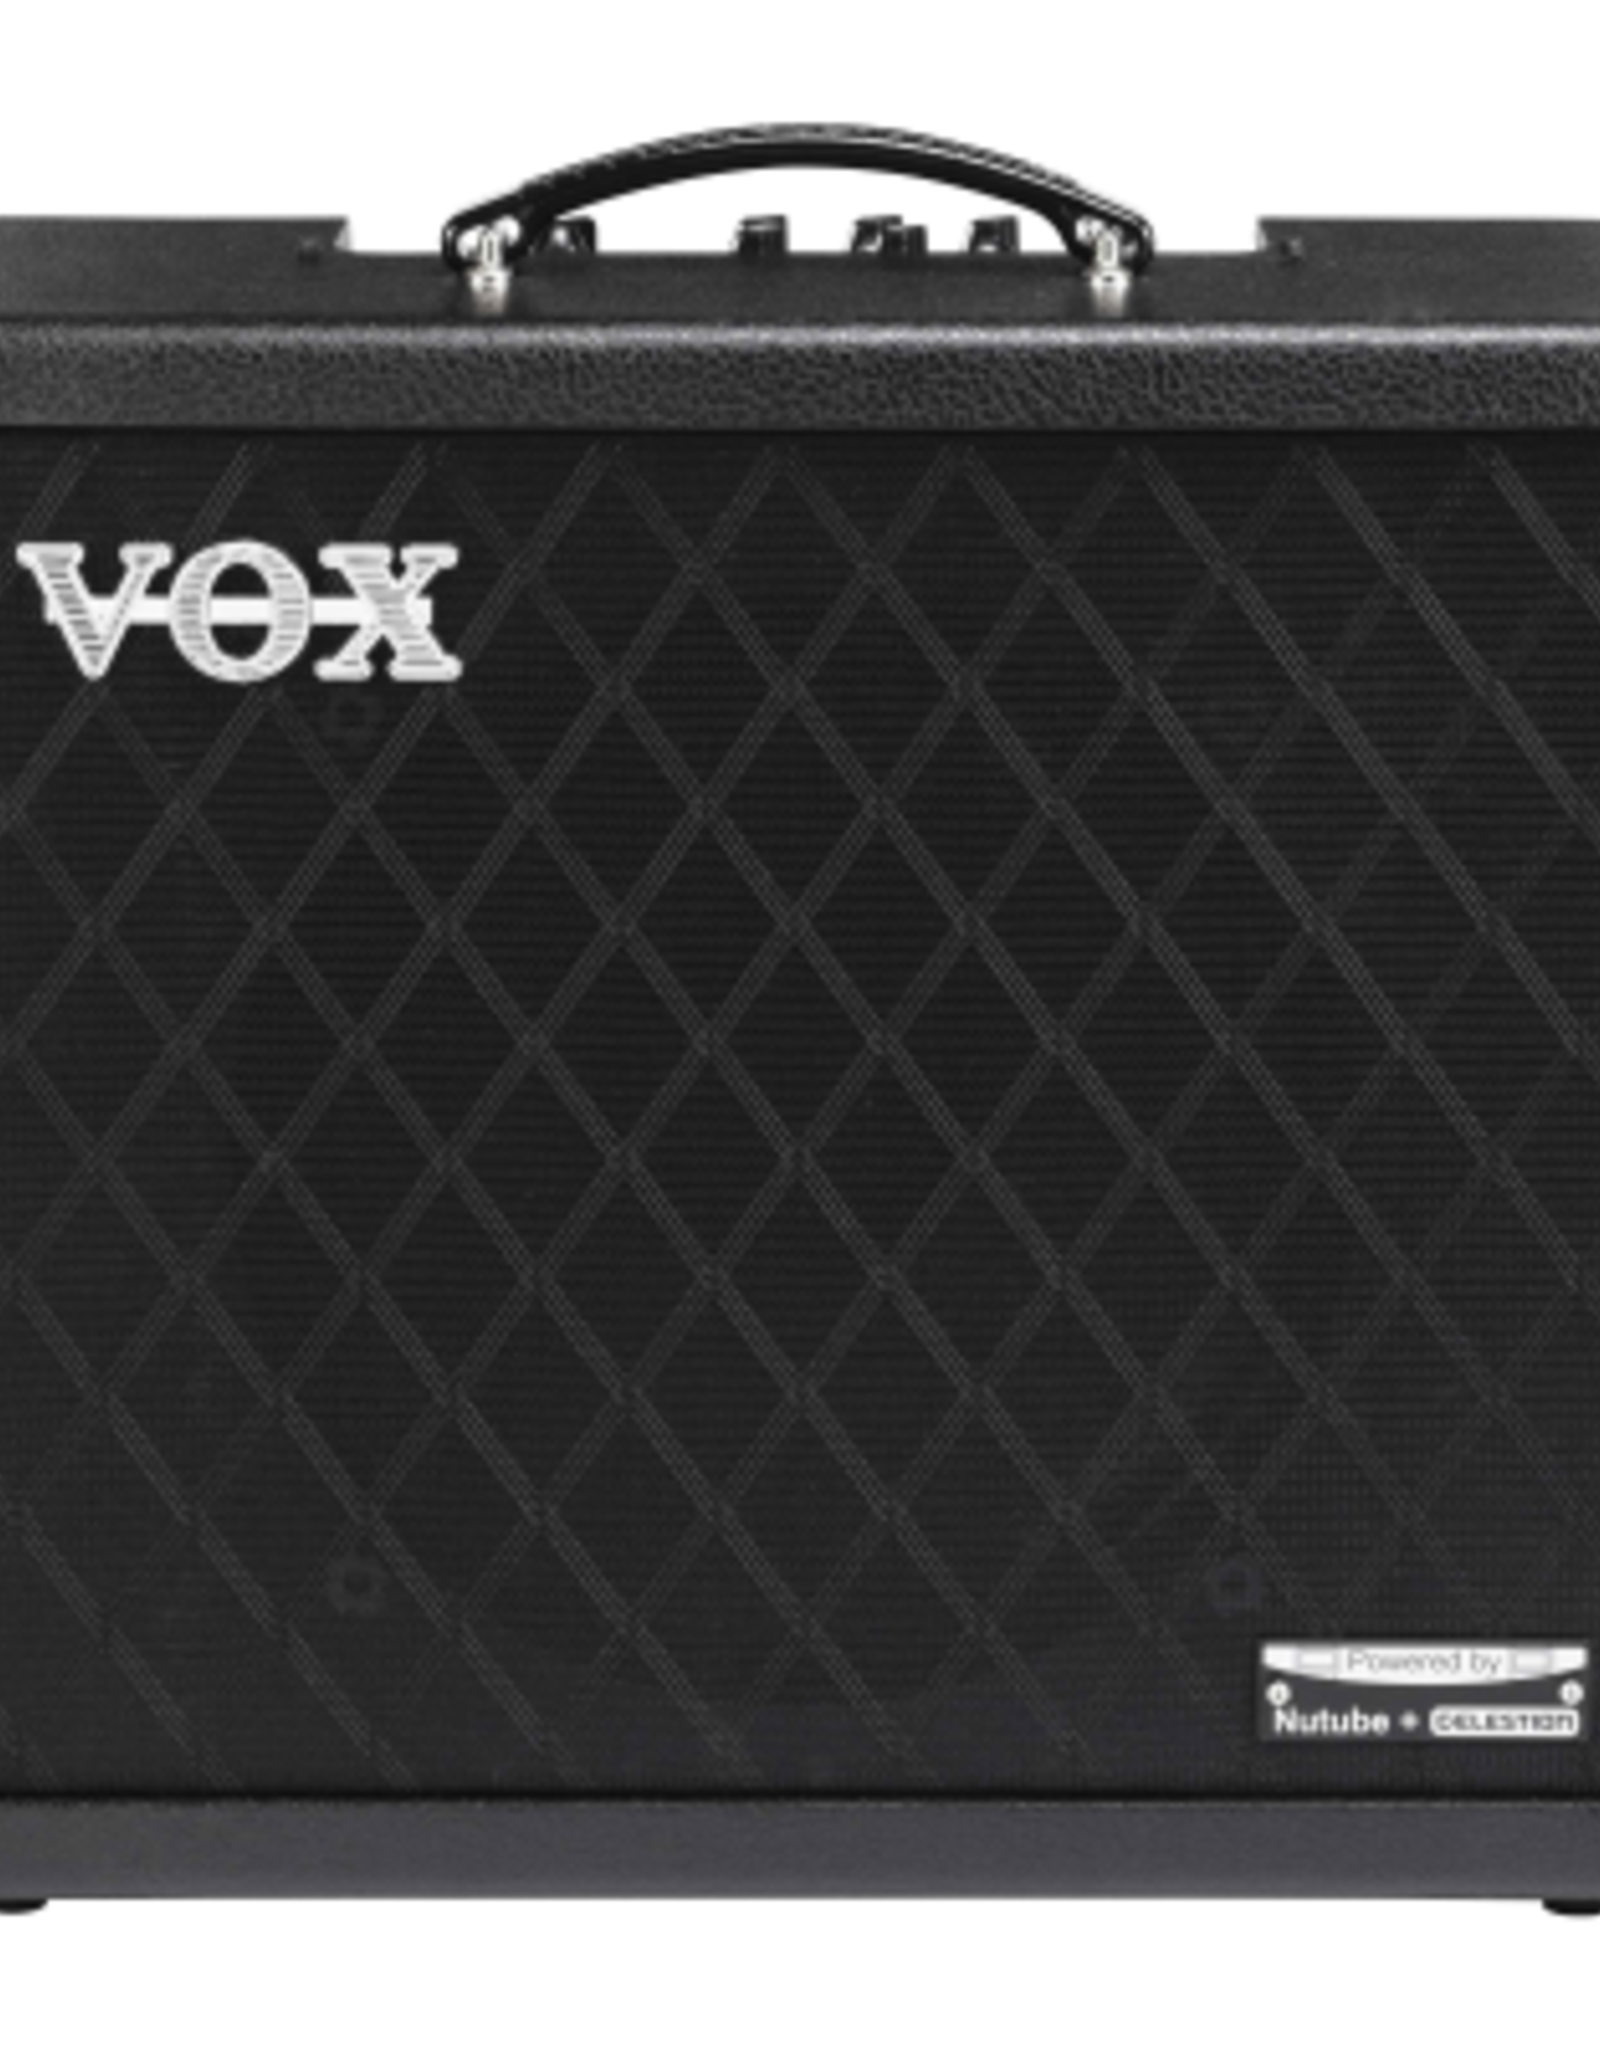 Vox Vox Cambridge 50w Digital Modeling Amplifier